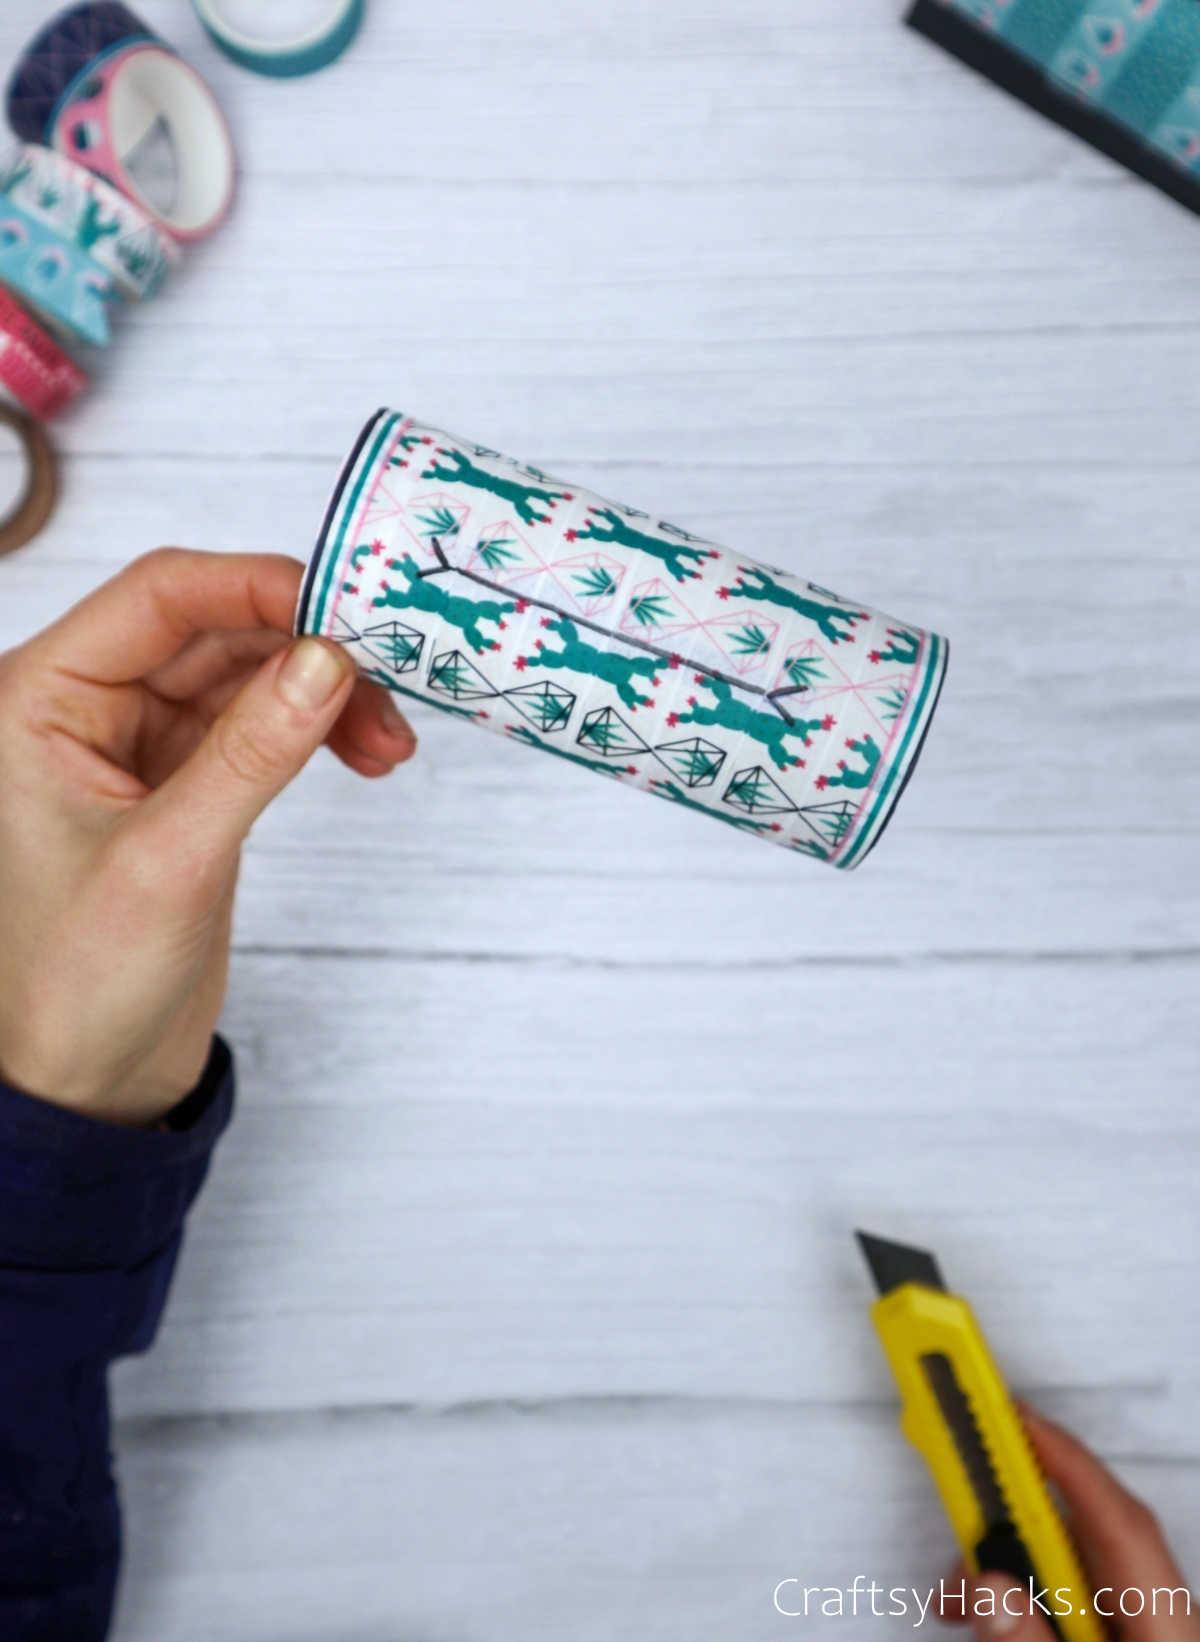 cutting hole in washi tape